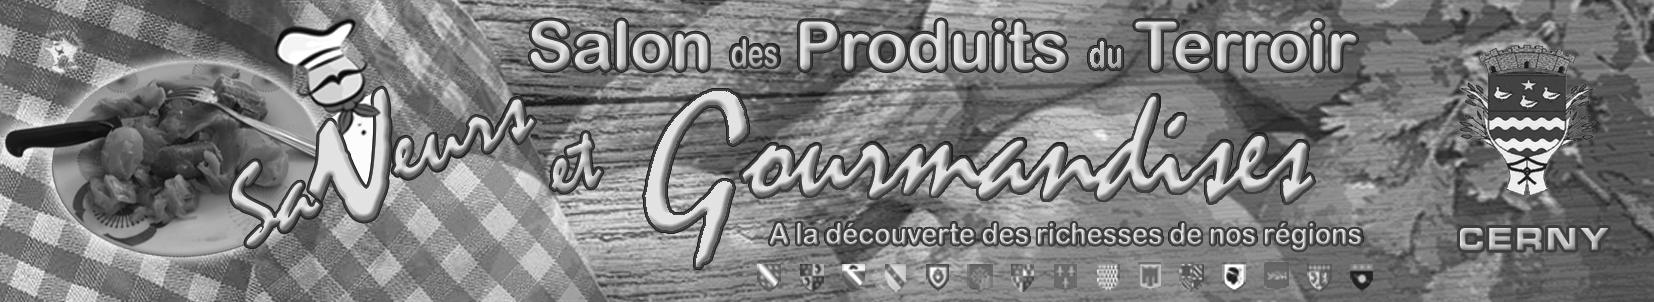 2020-gout-saveur-tradition-CERNY-SaveurGourmandises-1_NB